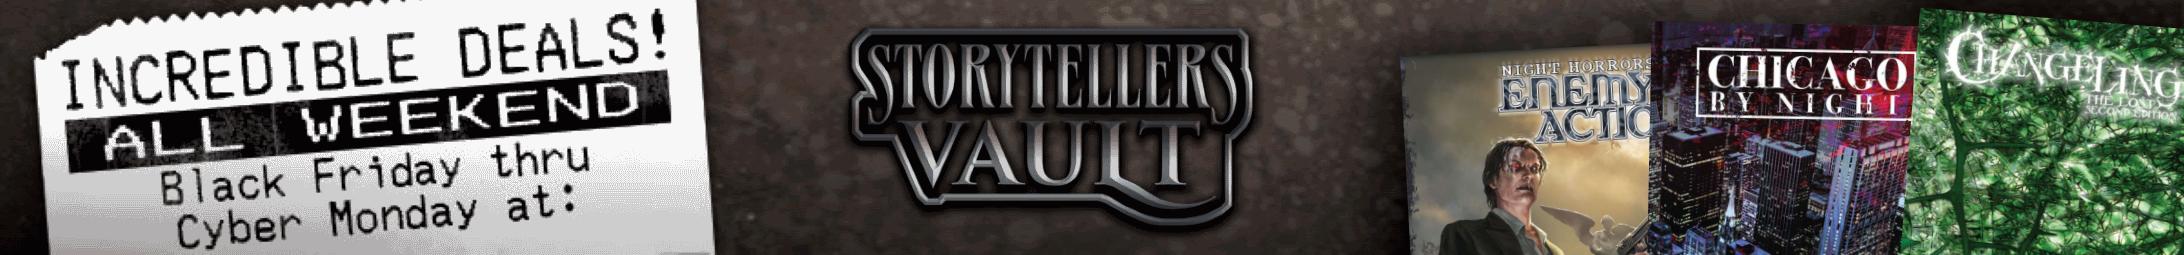 Black Friday/Cyber Monday @ Storytellers Vault